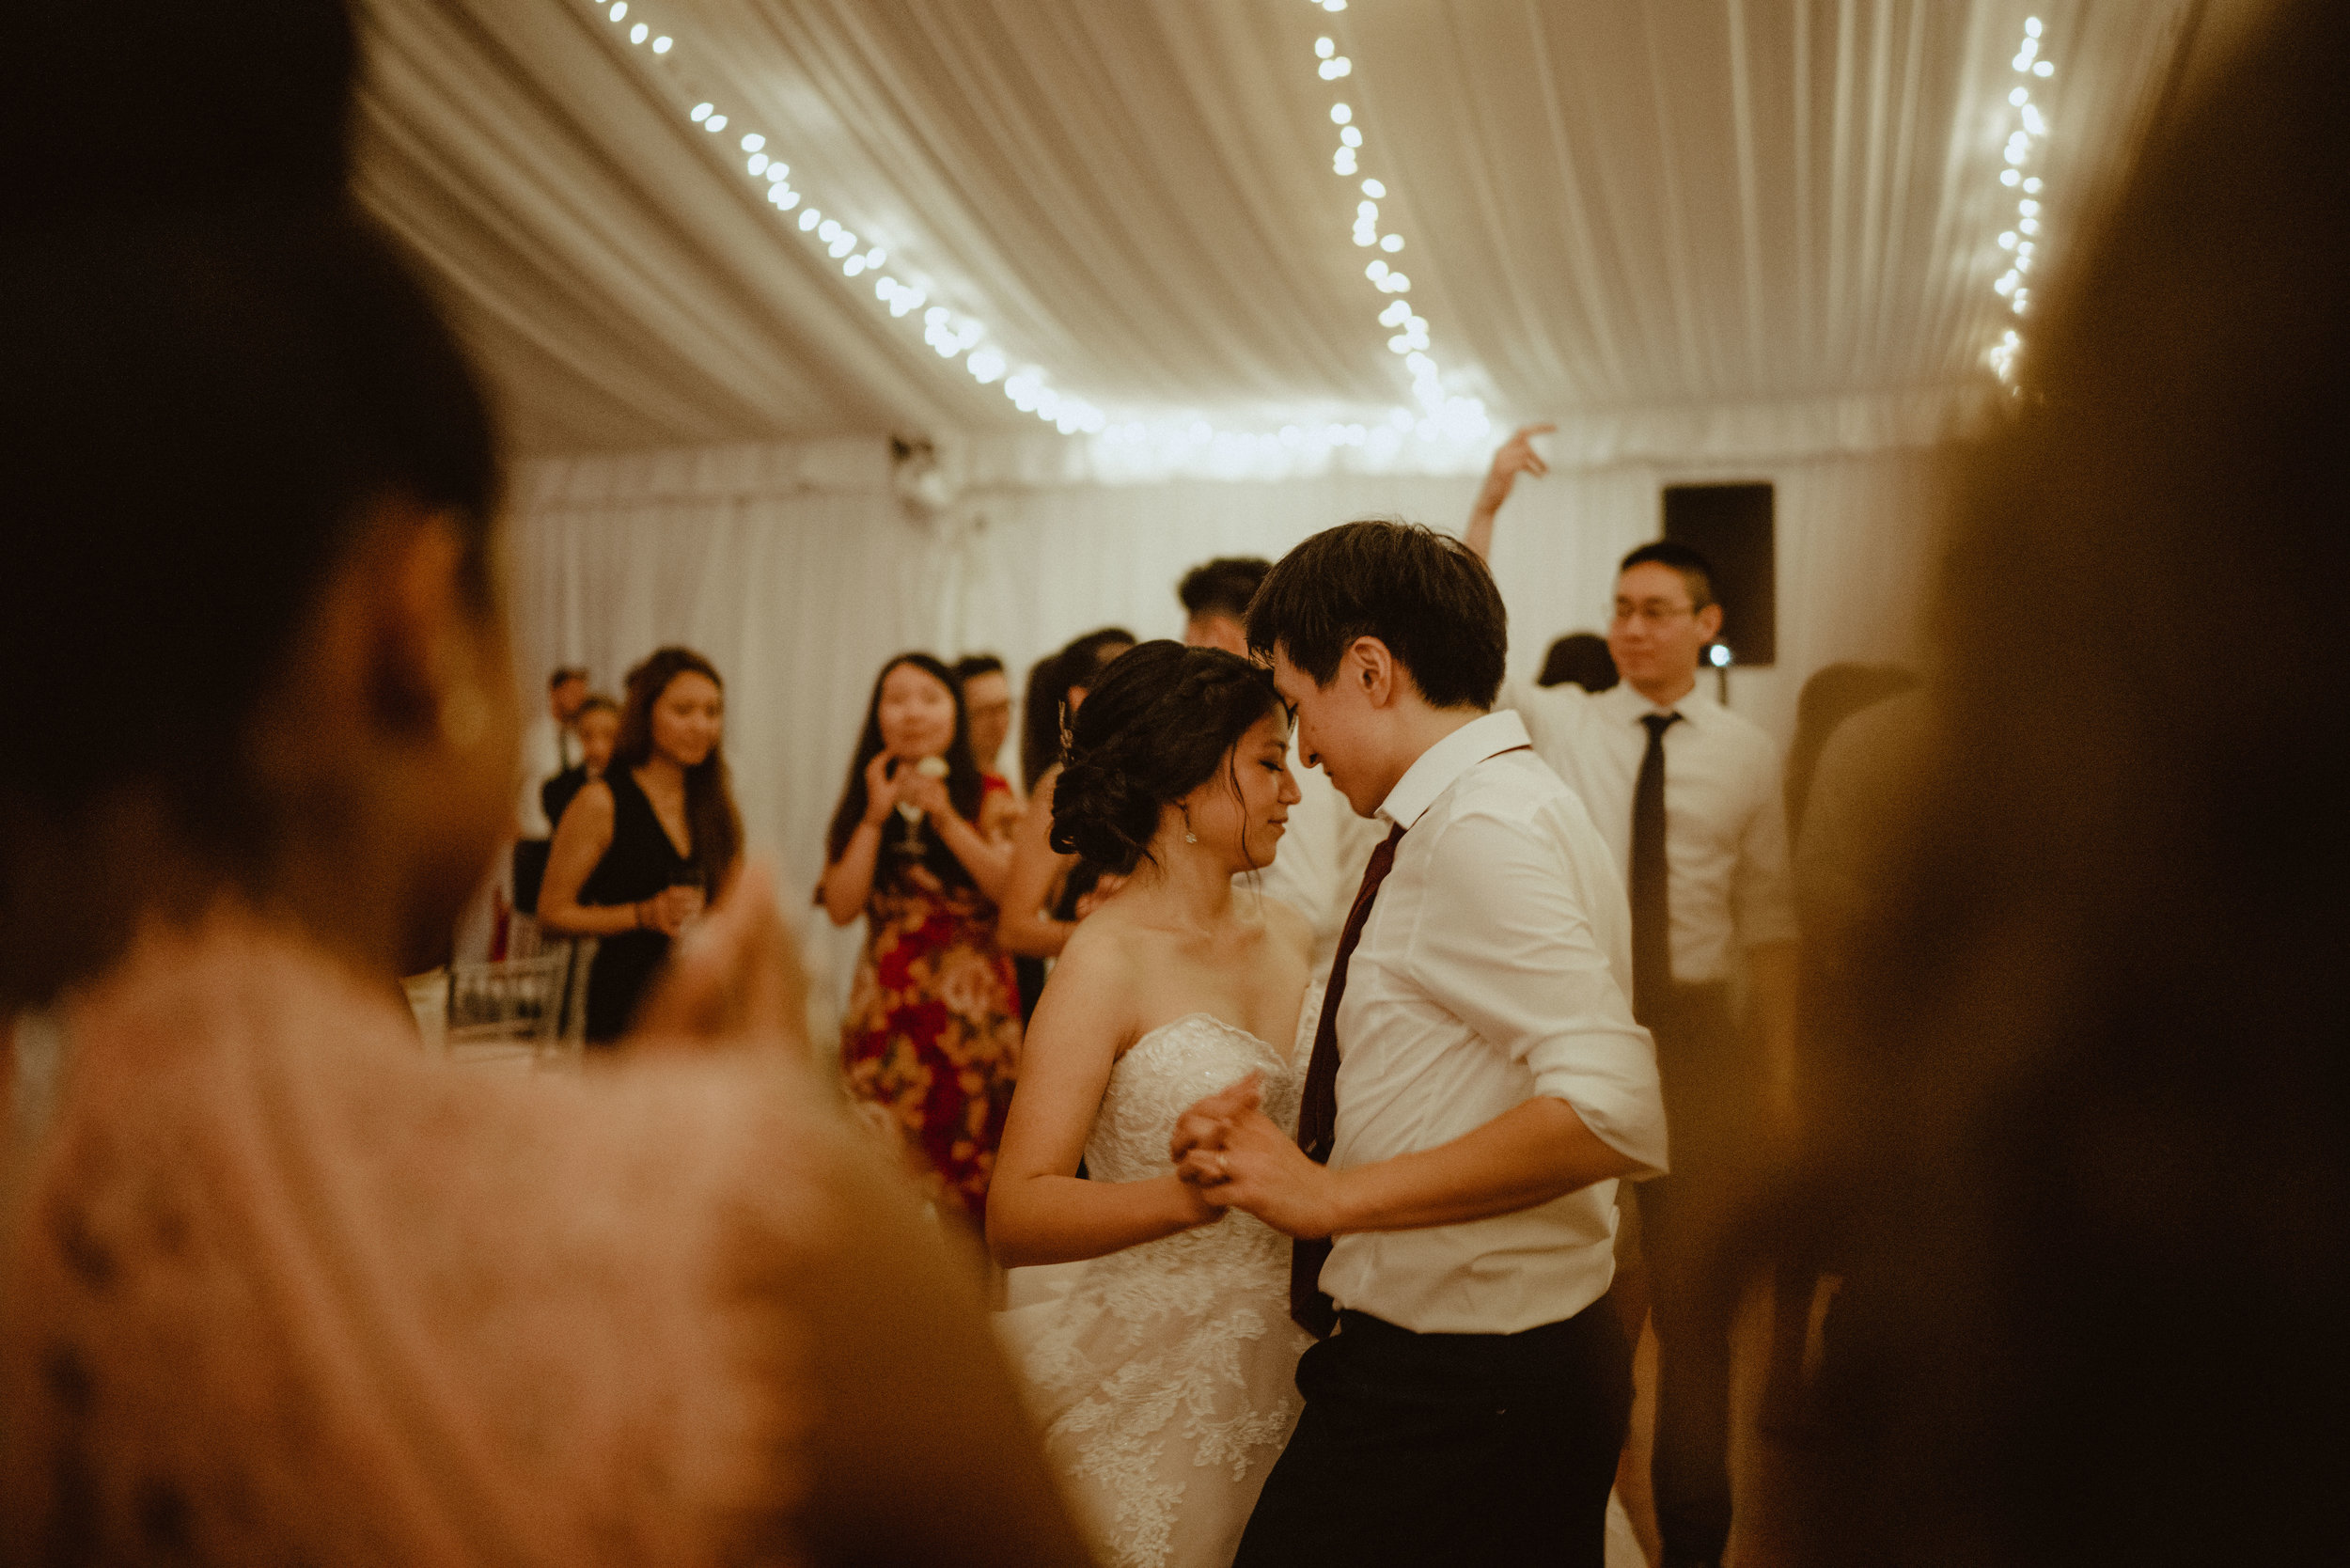 Irene-and-Jae-2019_Brooklyn_Wedding_Photographer_Chellise_Michael_Photography--180.jpg